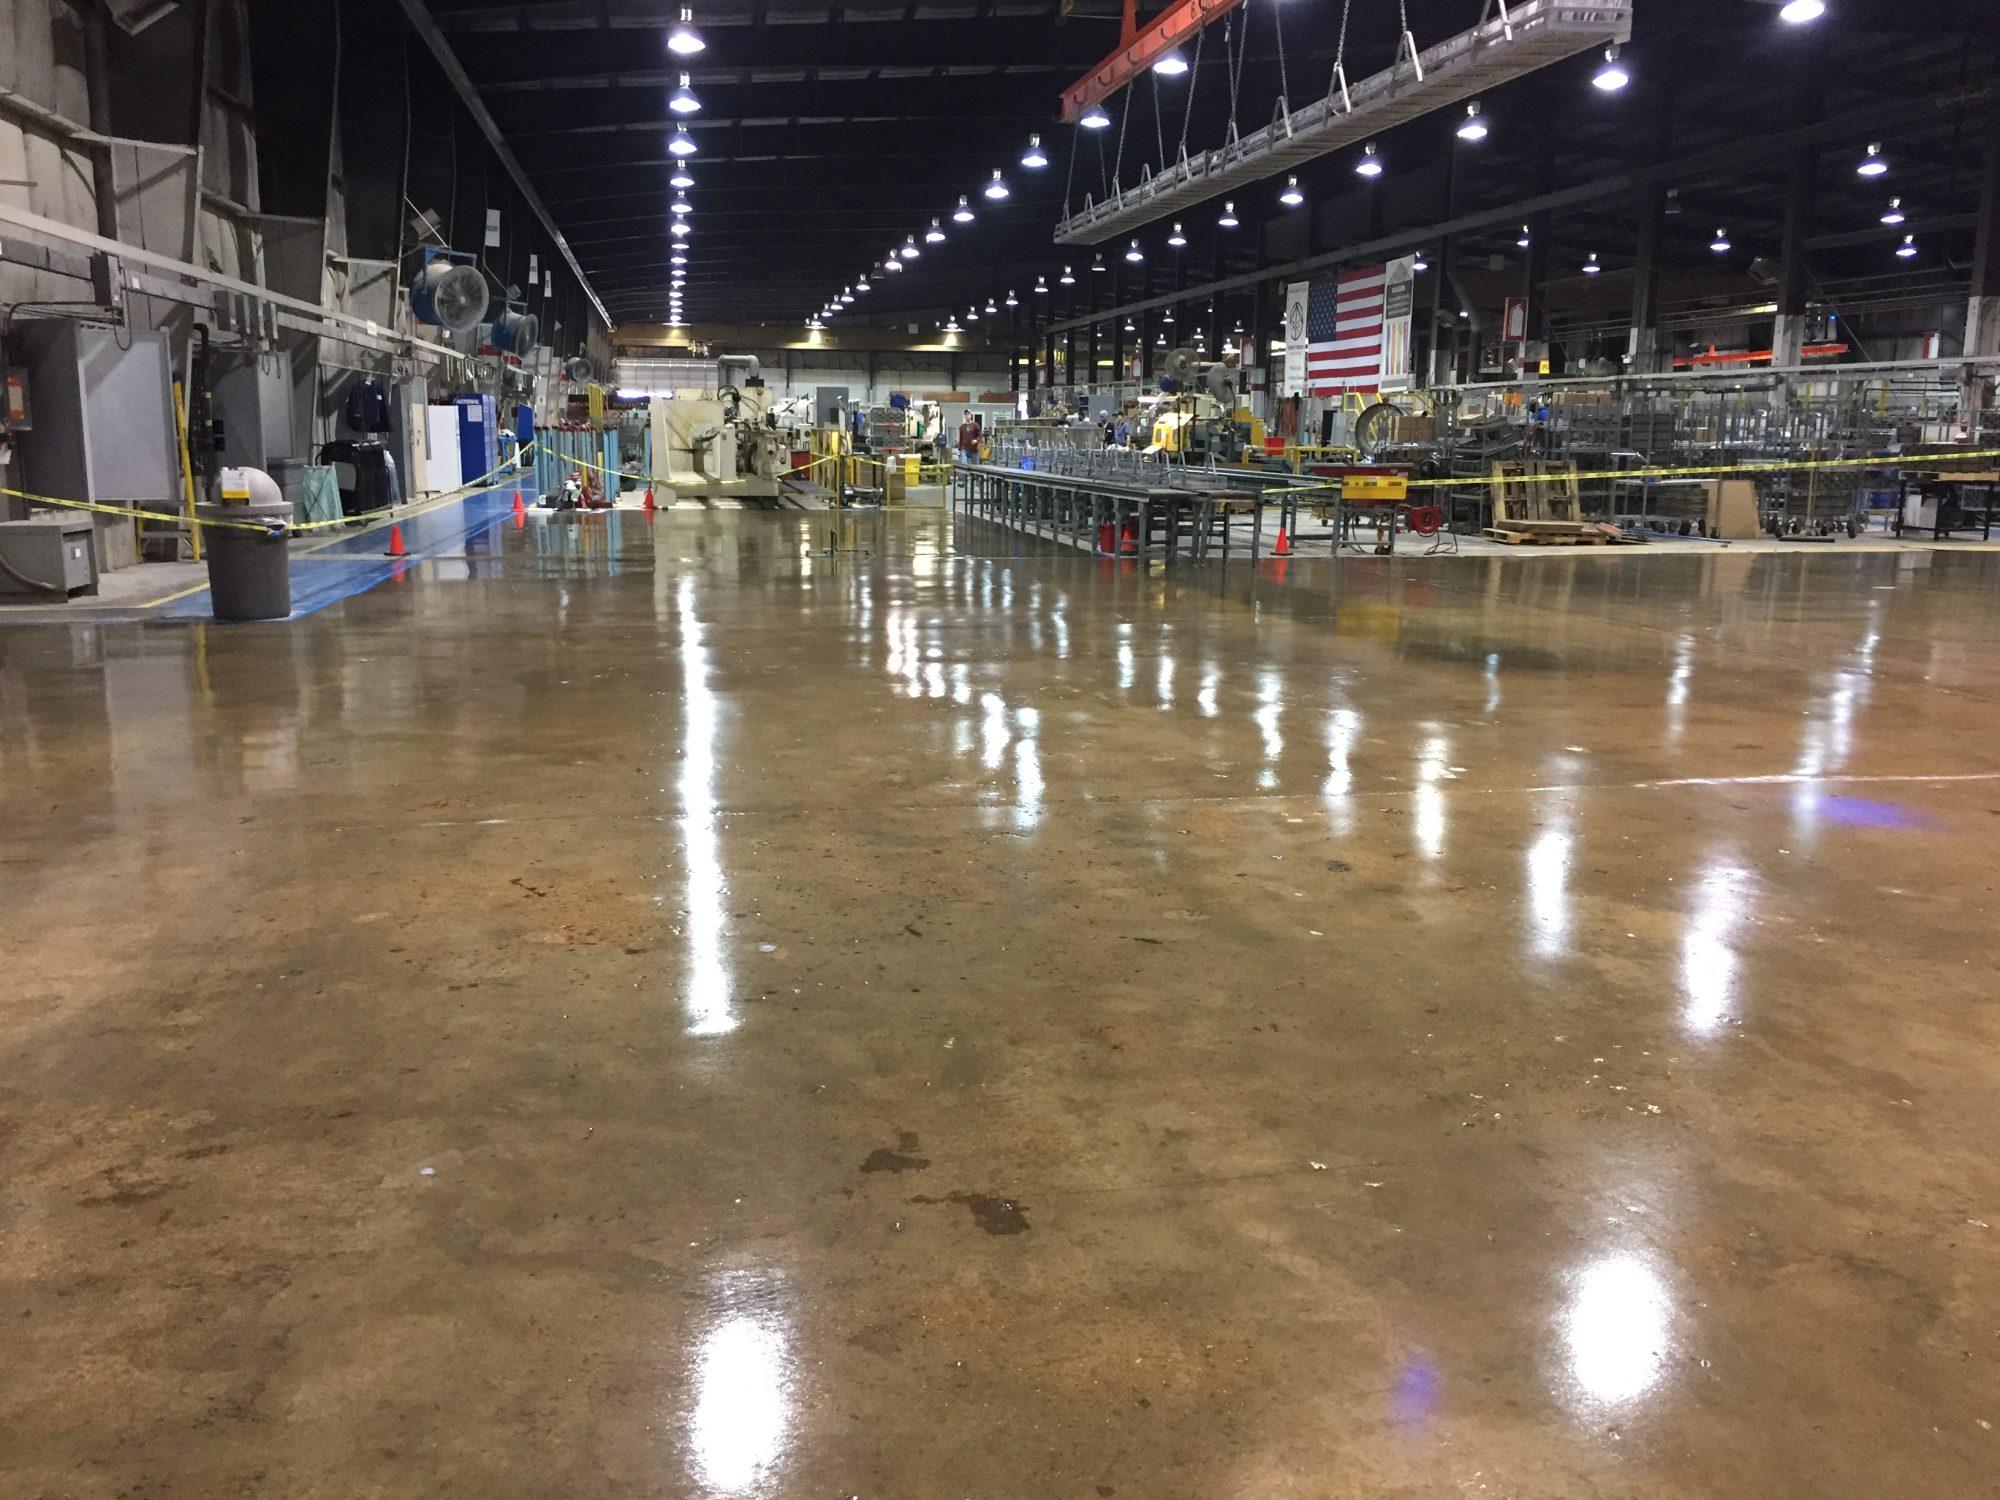 epoxy floor coatings, manufacturing floor coatings, clear epoxy